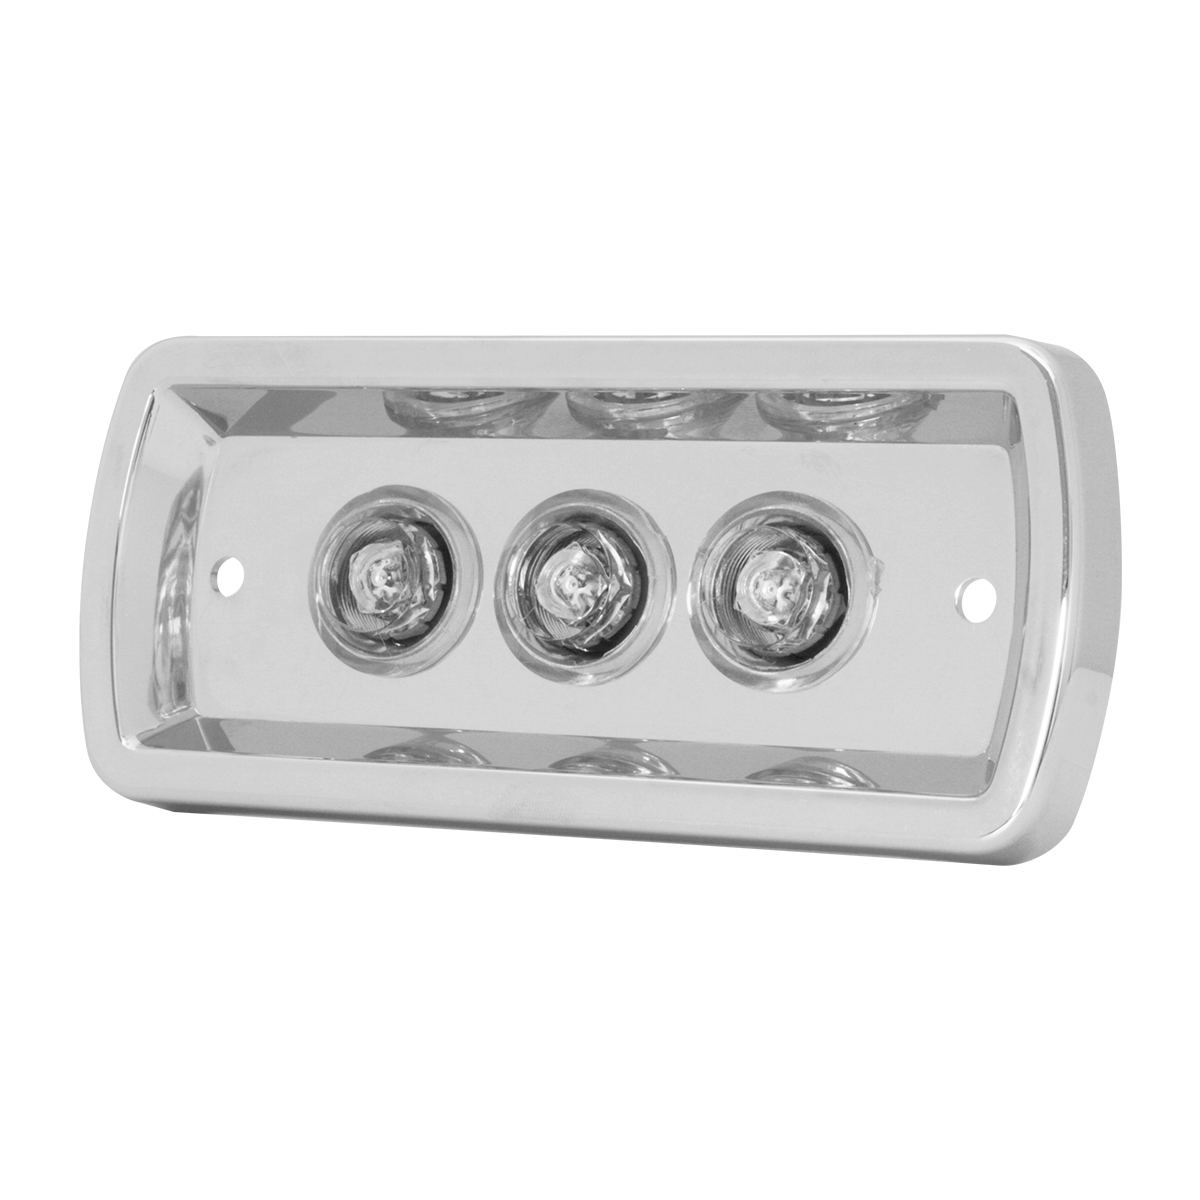 KW Daylight Cab Door LED Light